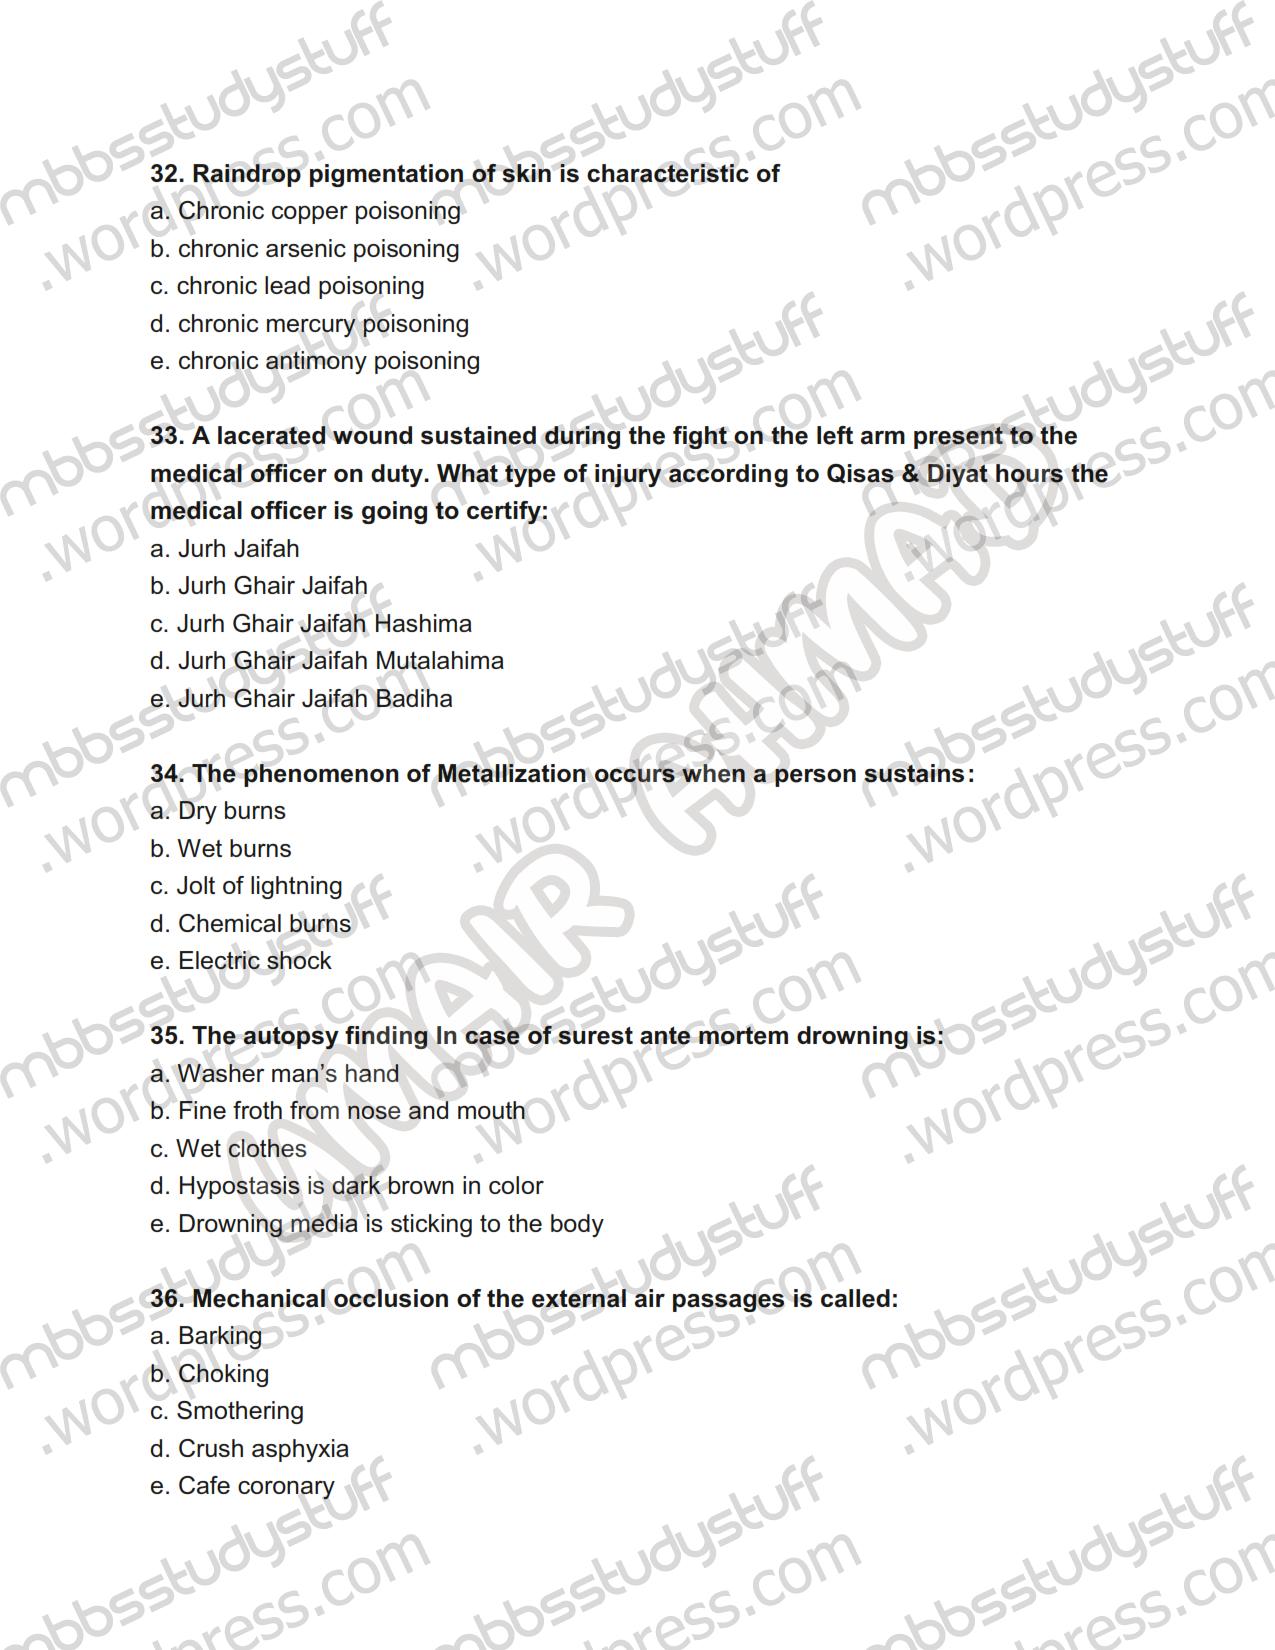 uhs forensic prof mcq | MBBS Study Stuff